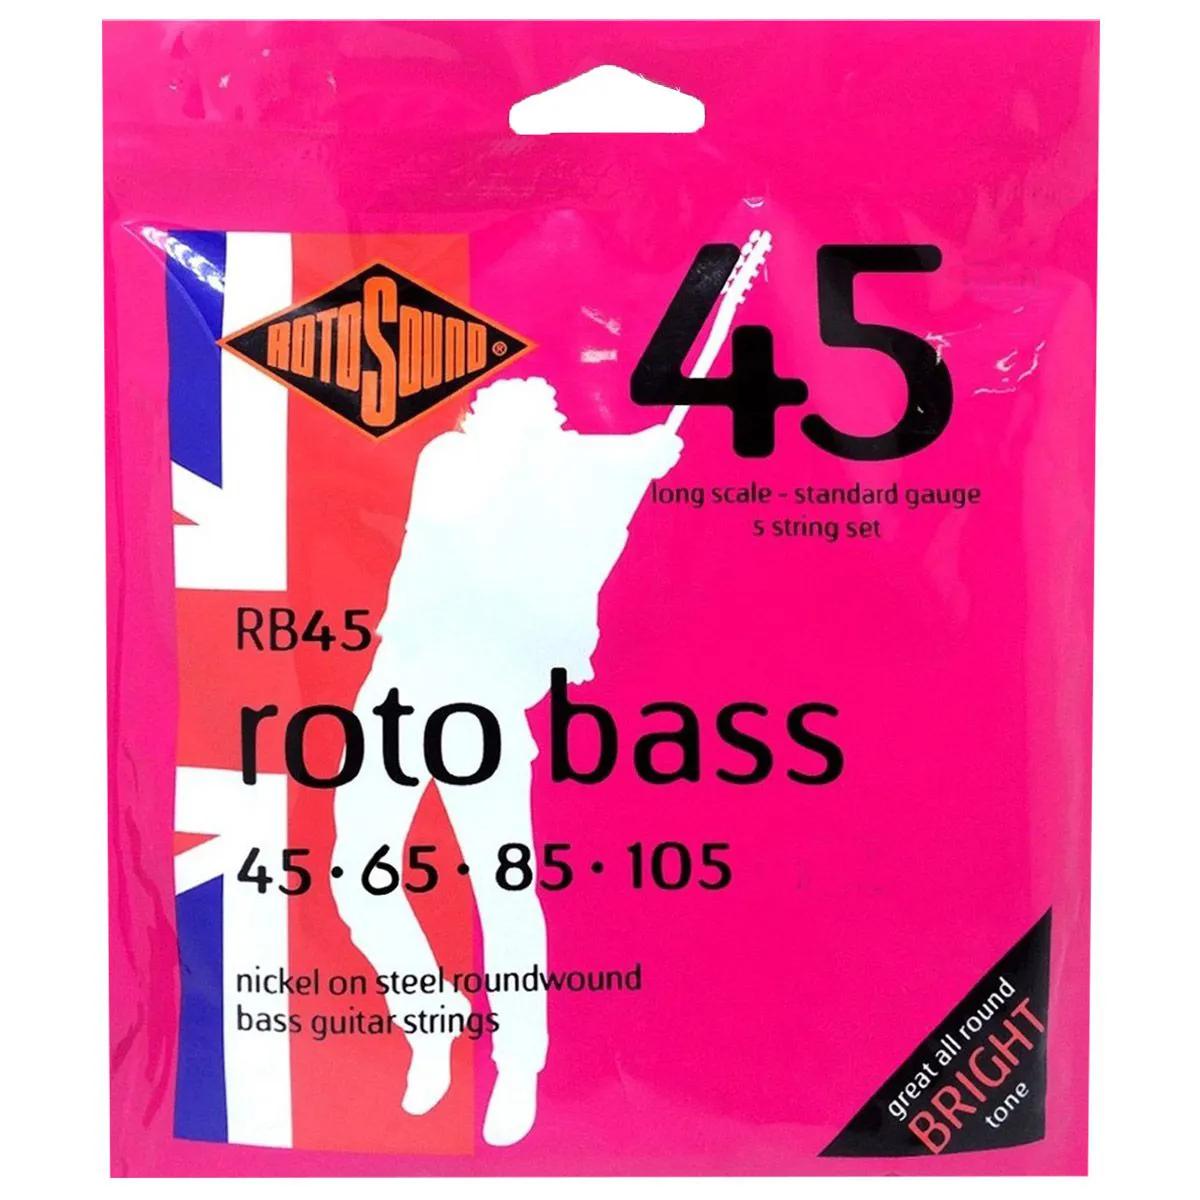 Encordoamento Rotosound RB45 045/105 para Contrabaixo